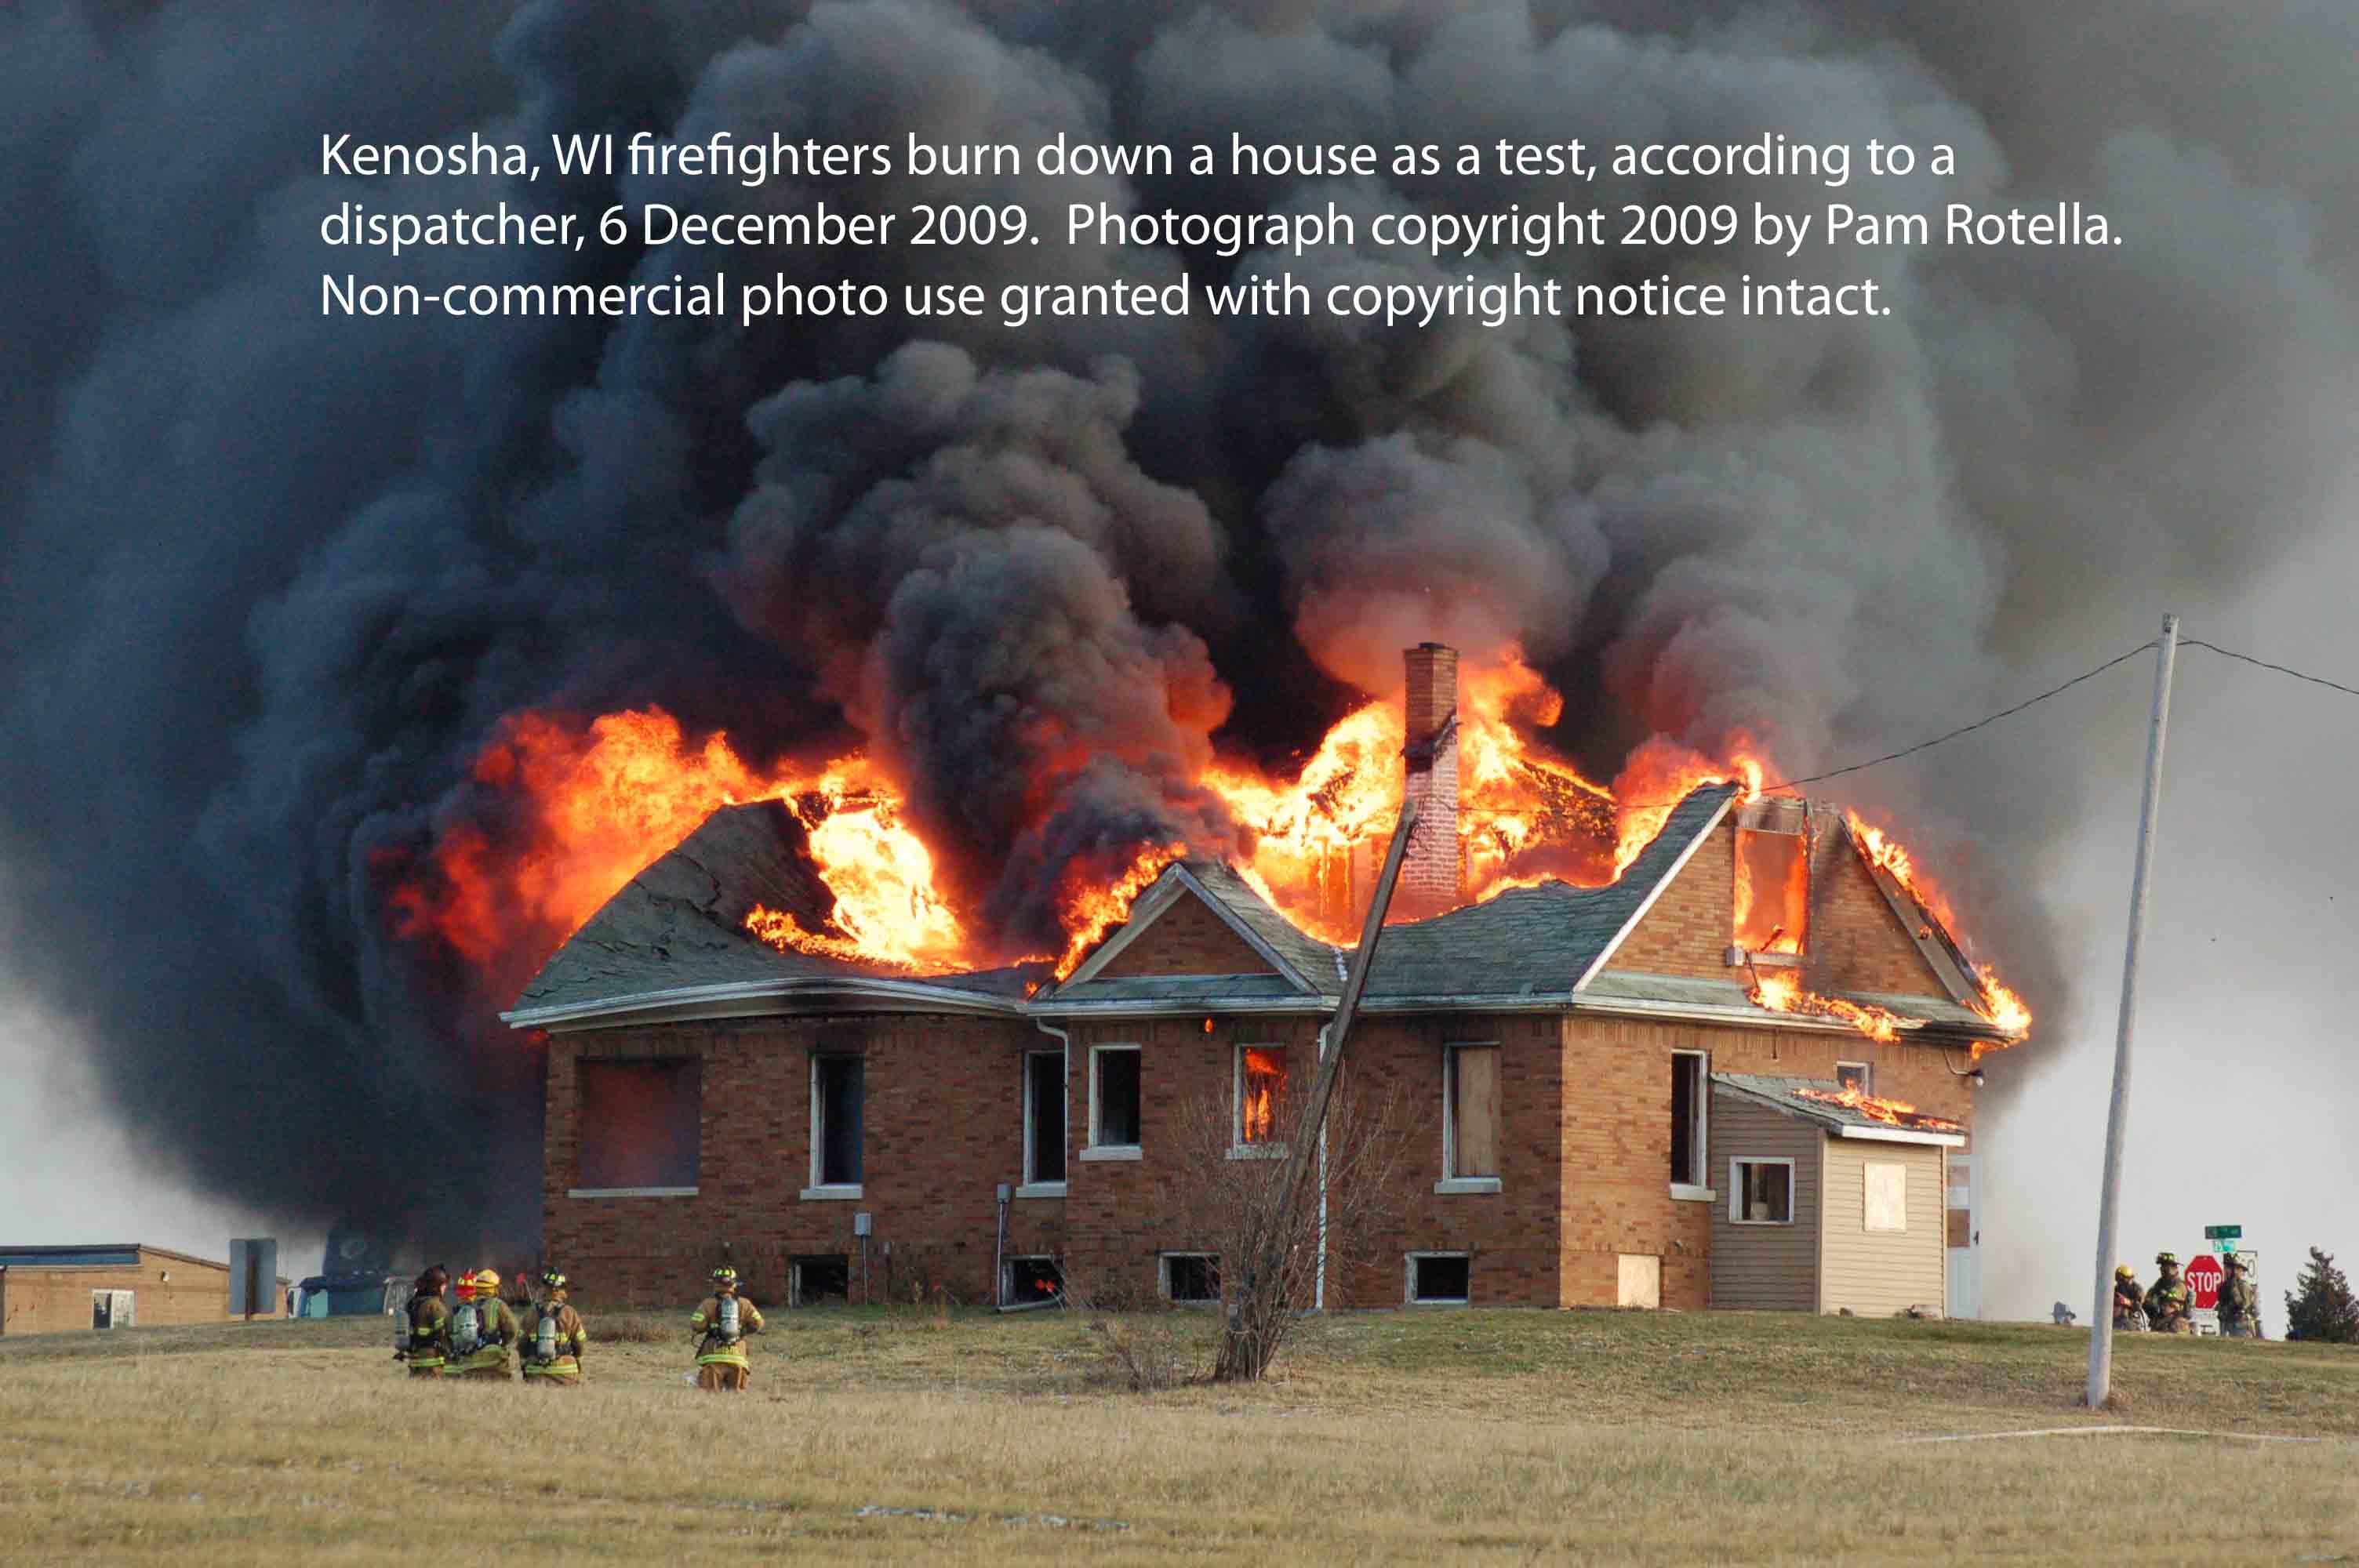 Kenosha firefighters burn down house as test, 6 Dec 2009